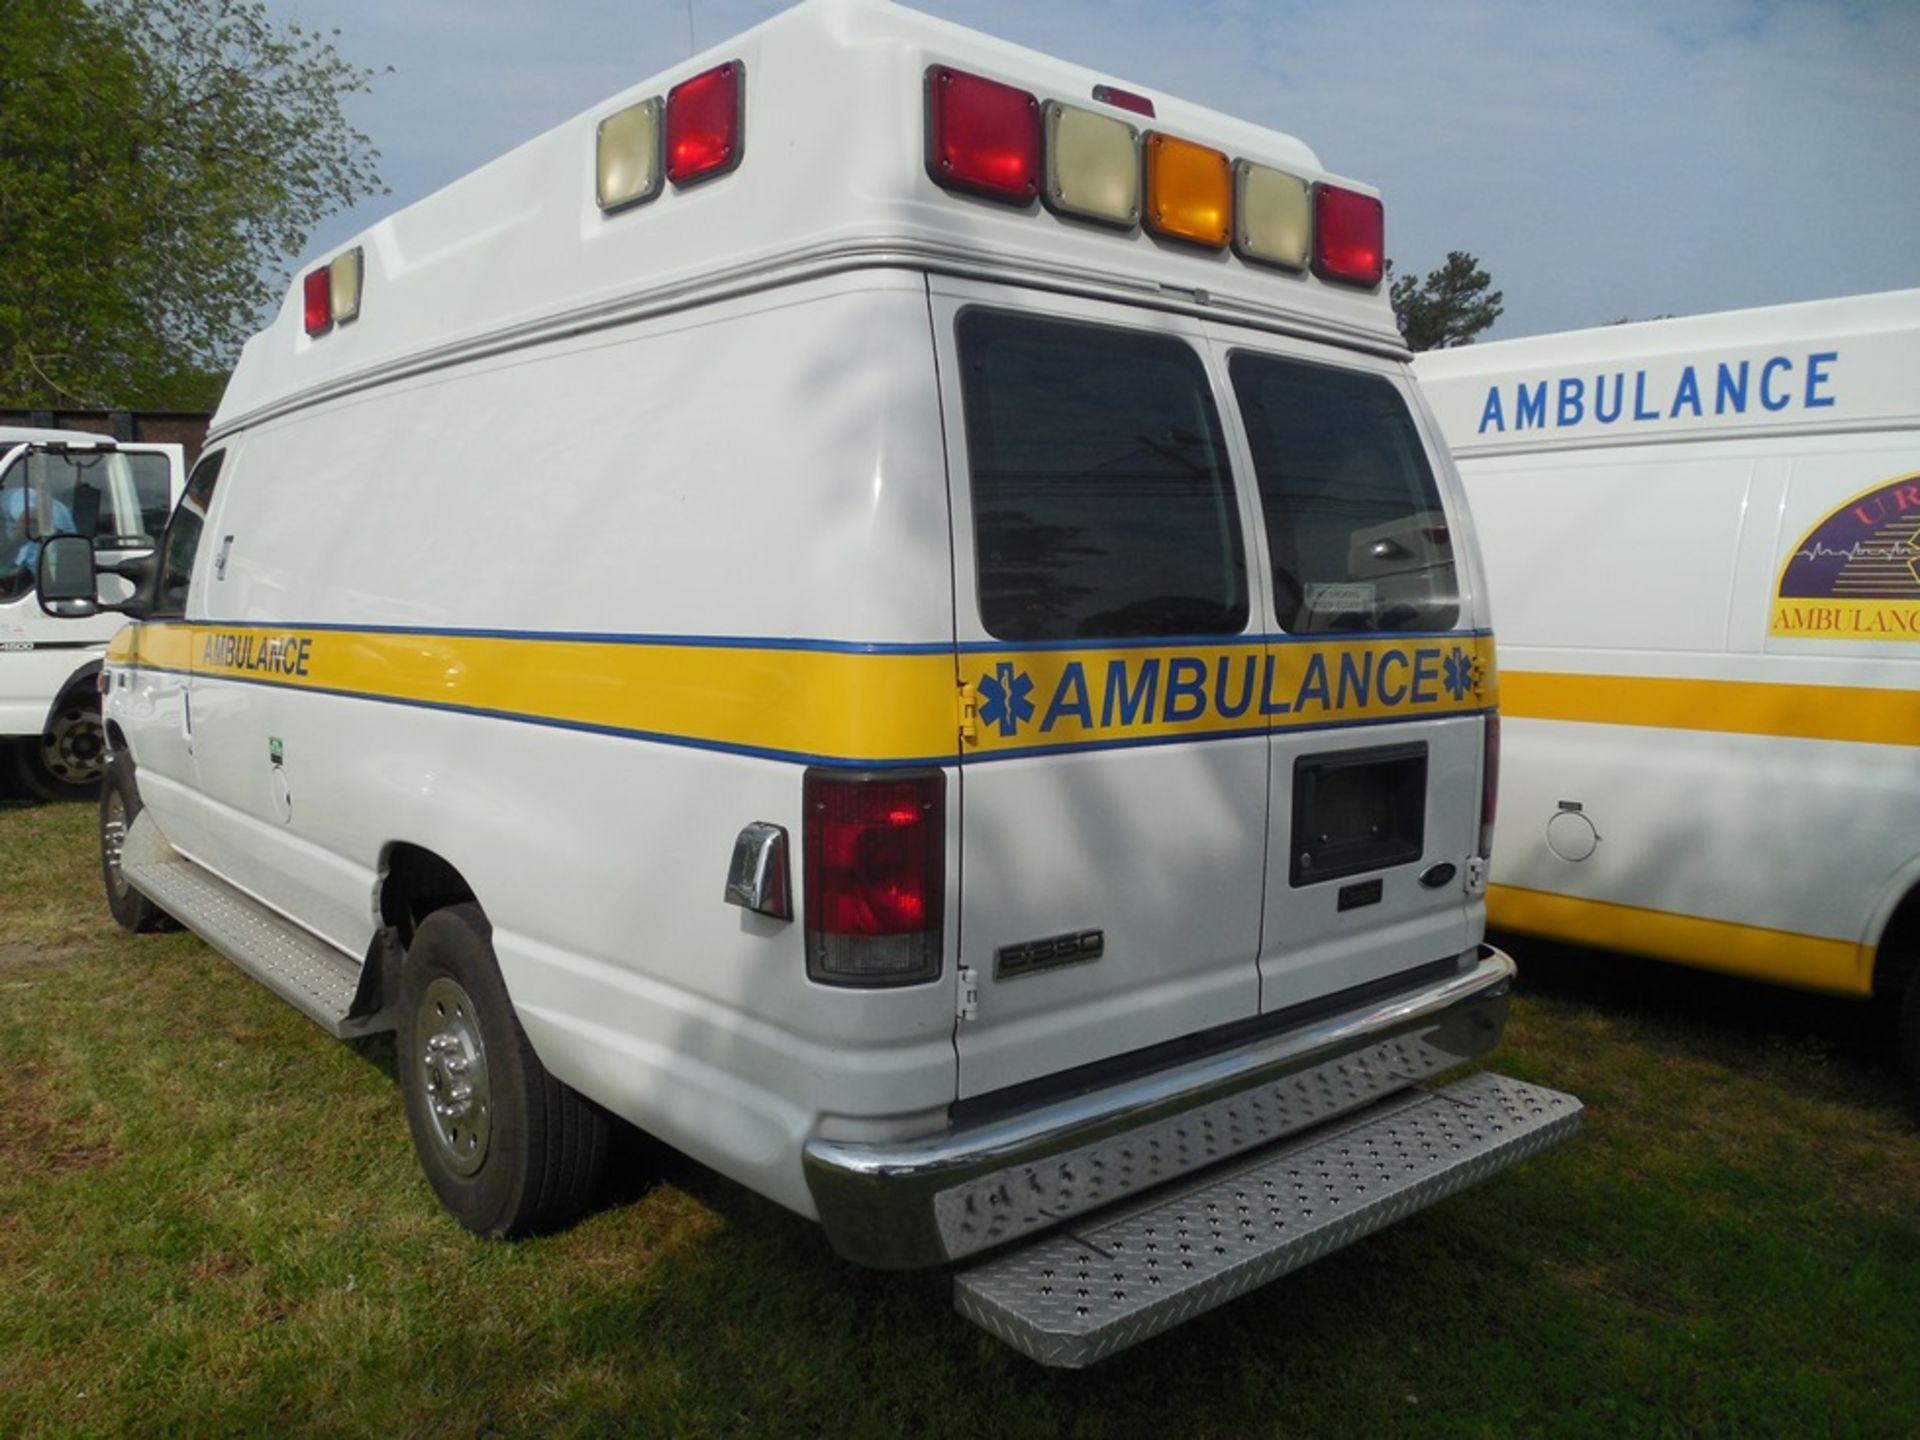 2010 Ford E350 Crusader Wheel Coach van ambulance 214,465 miles vin# 1FDSS3EP9ADA32493 - Image 5 of 6